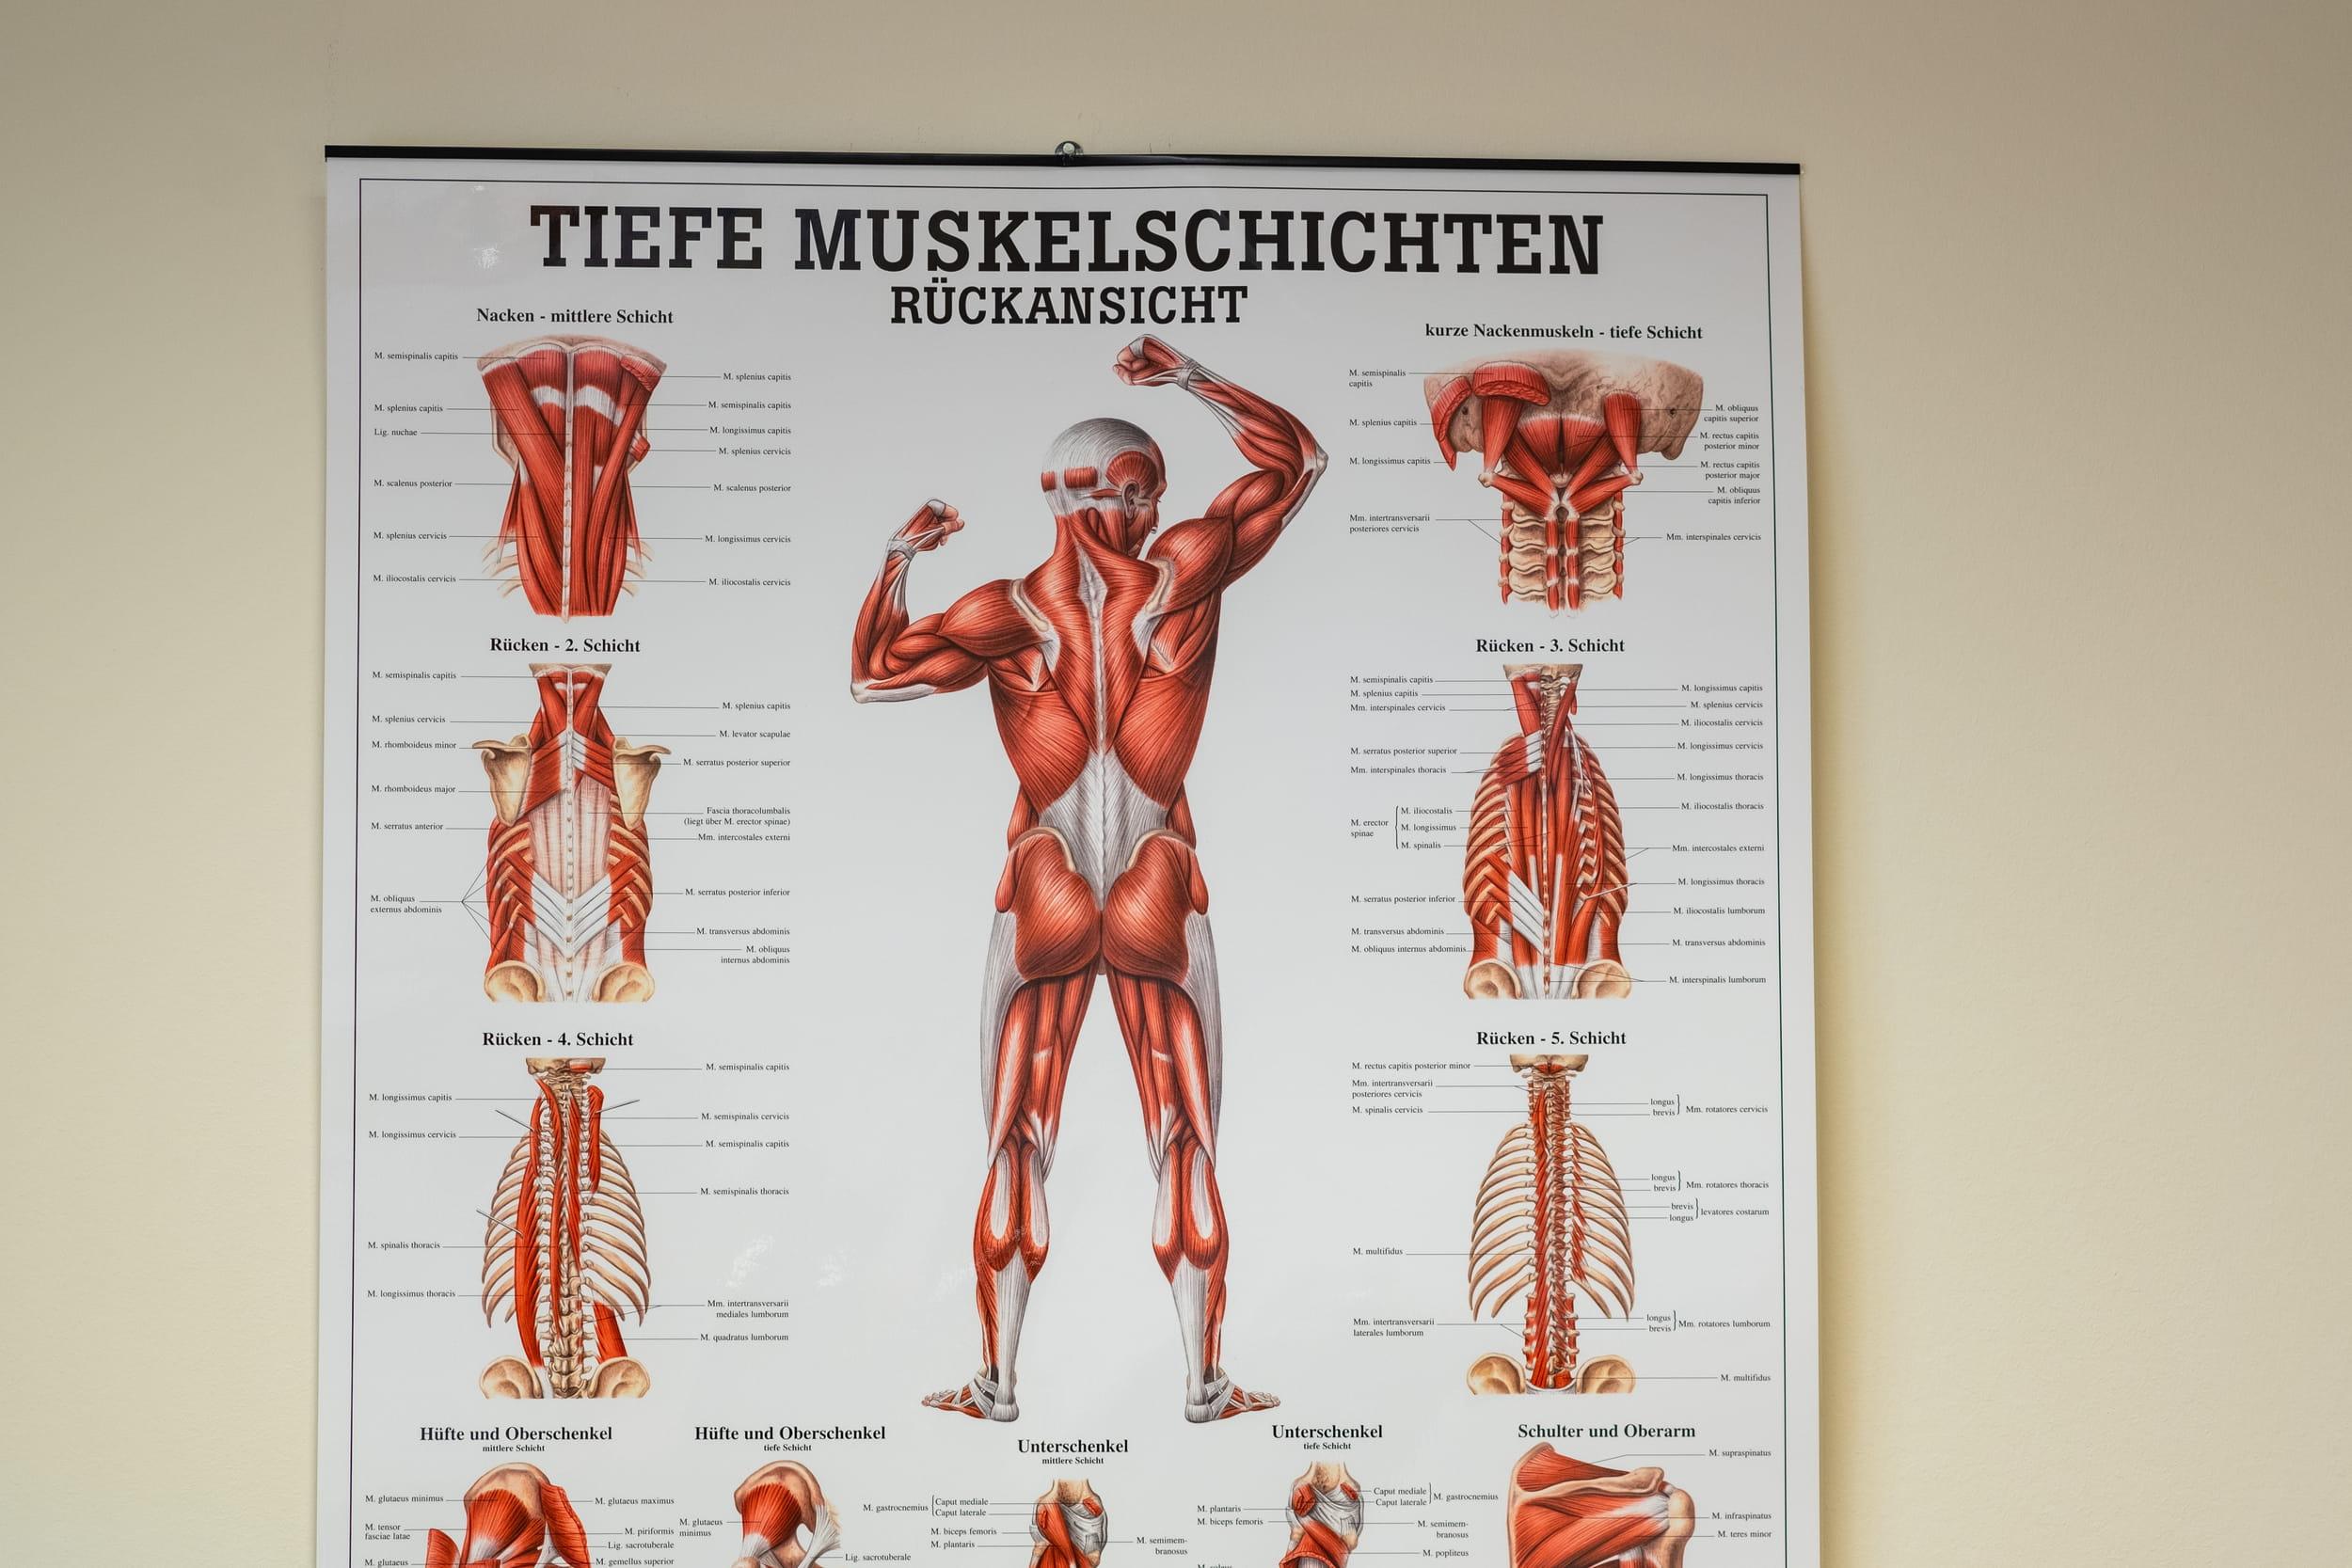 Wirbelsäulenchirurgie & Neurochirurgie